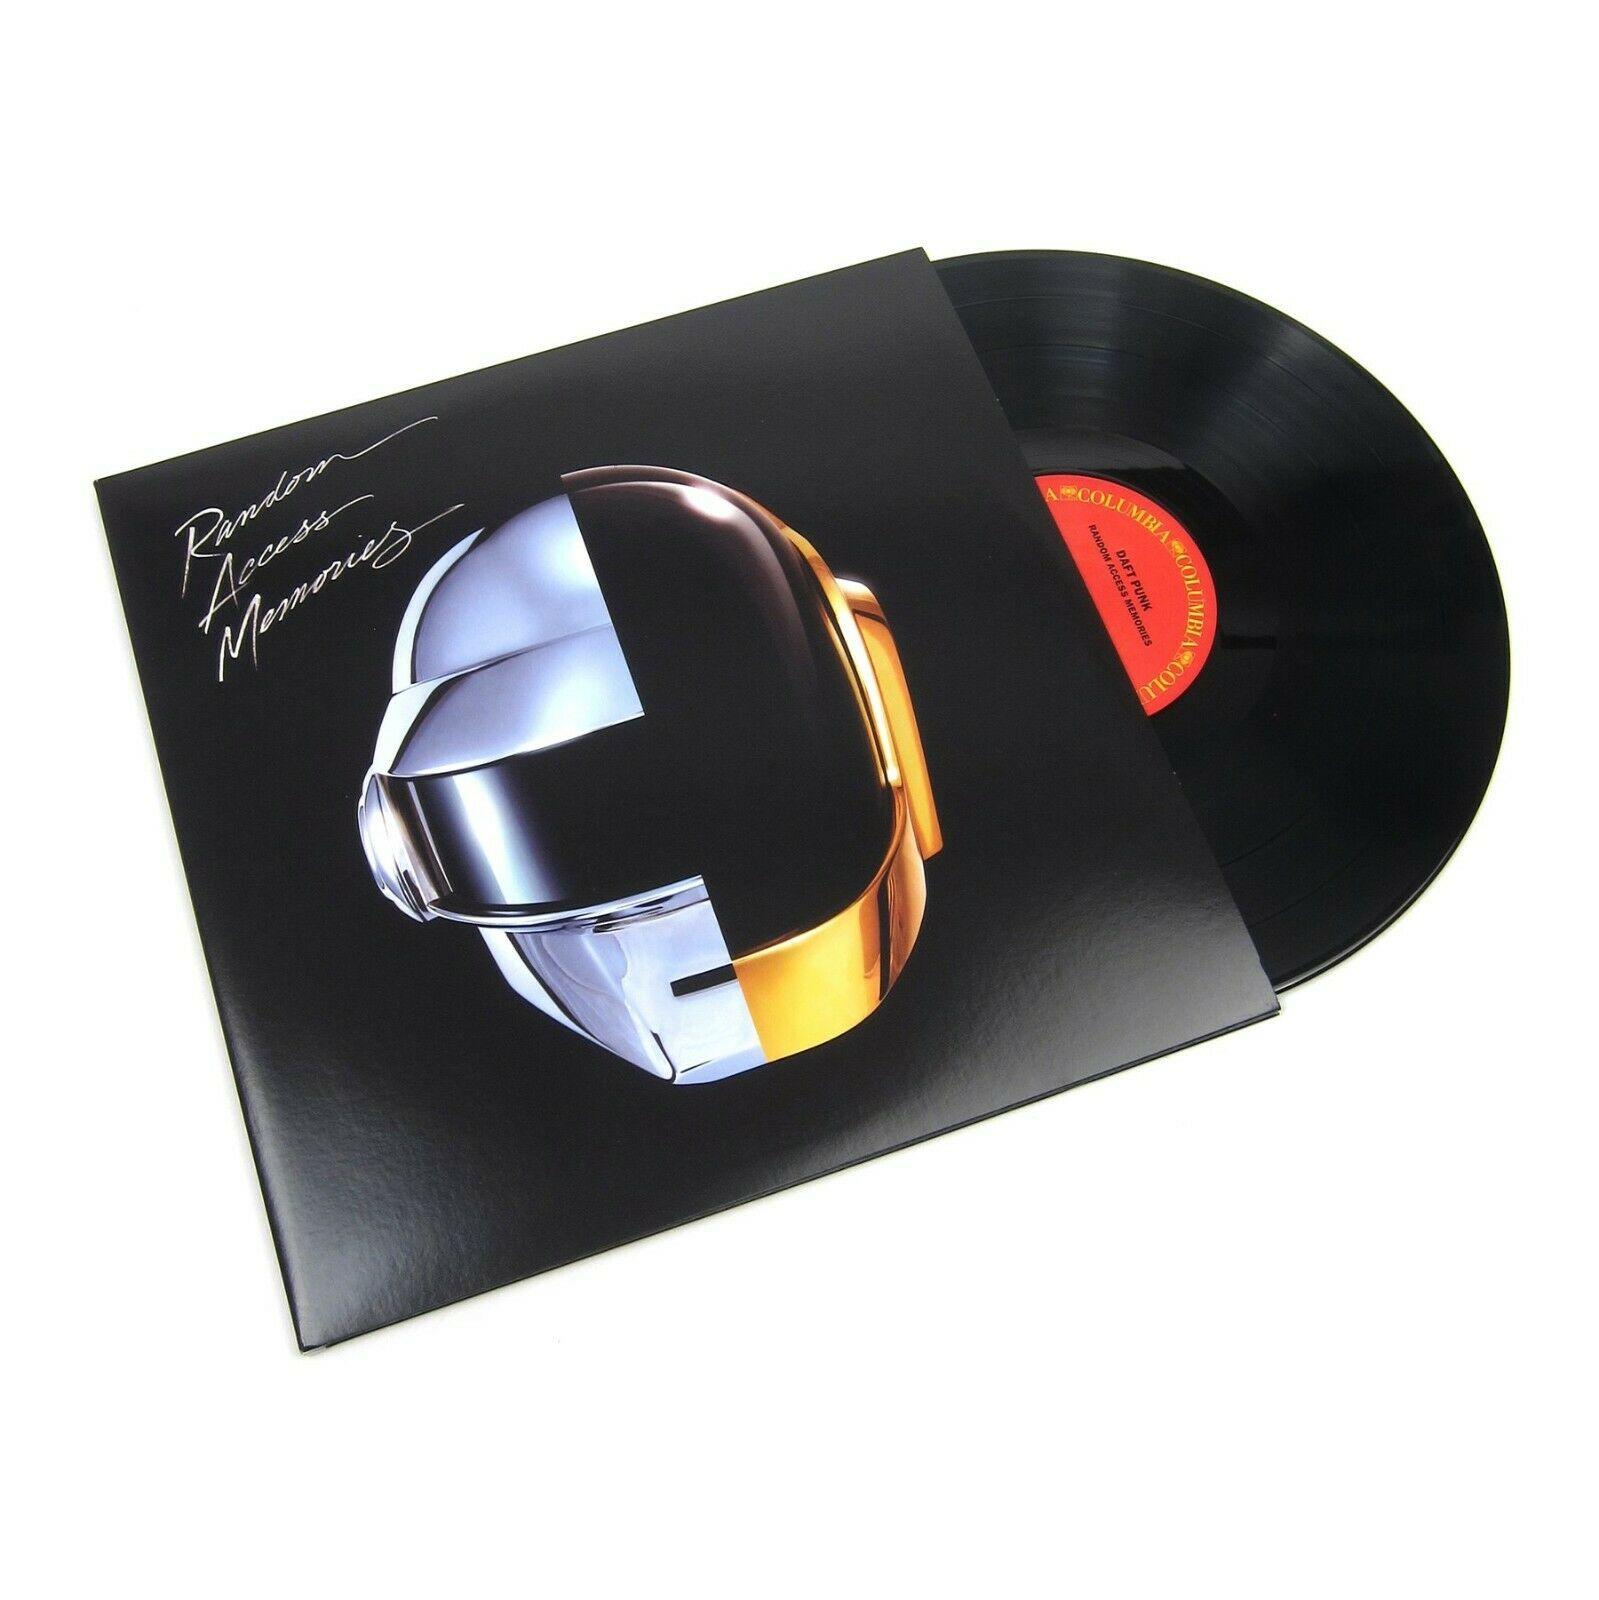 Daft Punk Random Access Memories lp